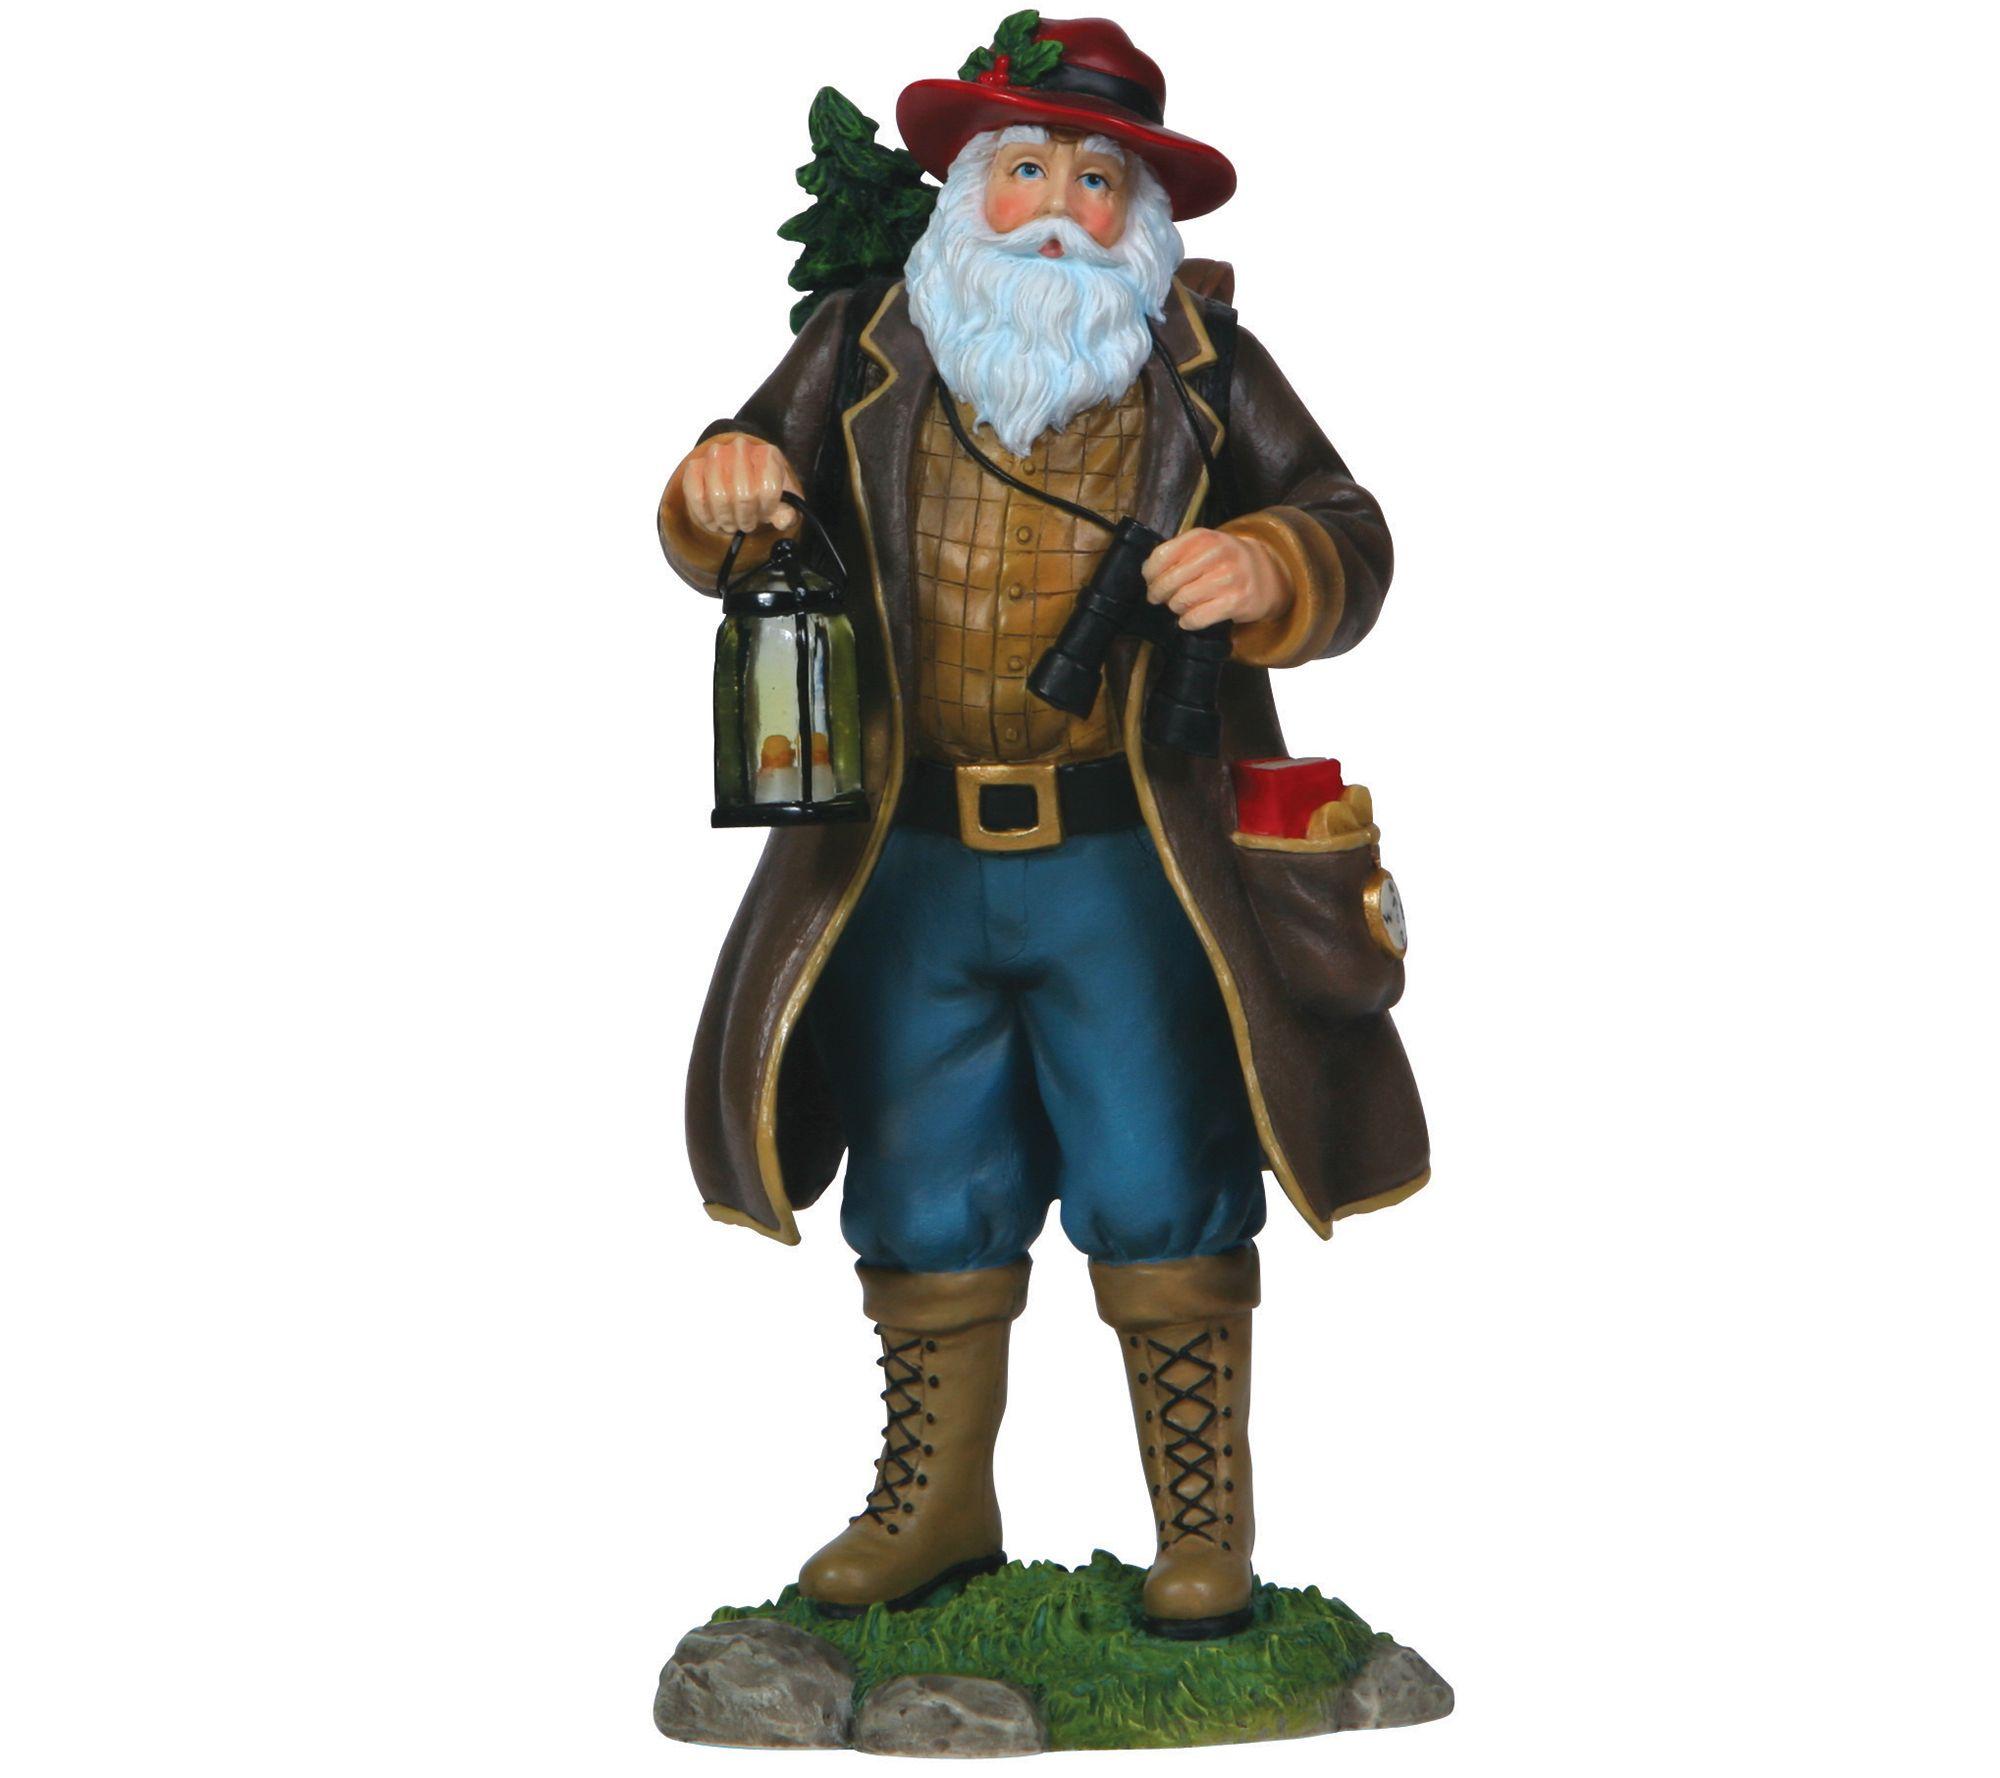 Camping claus santa figurine by pipka — qvc